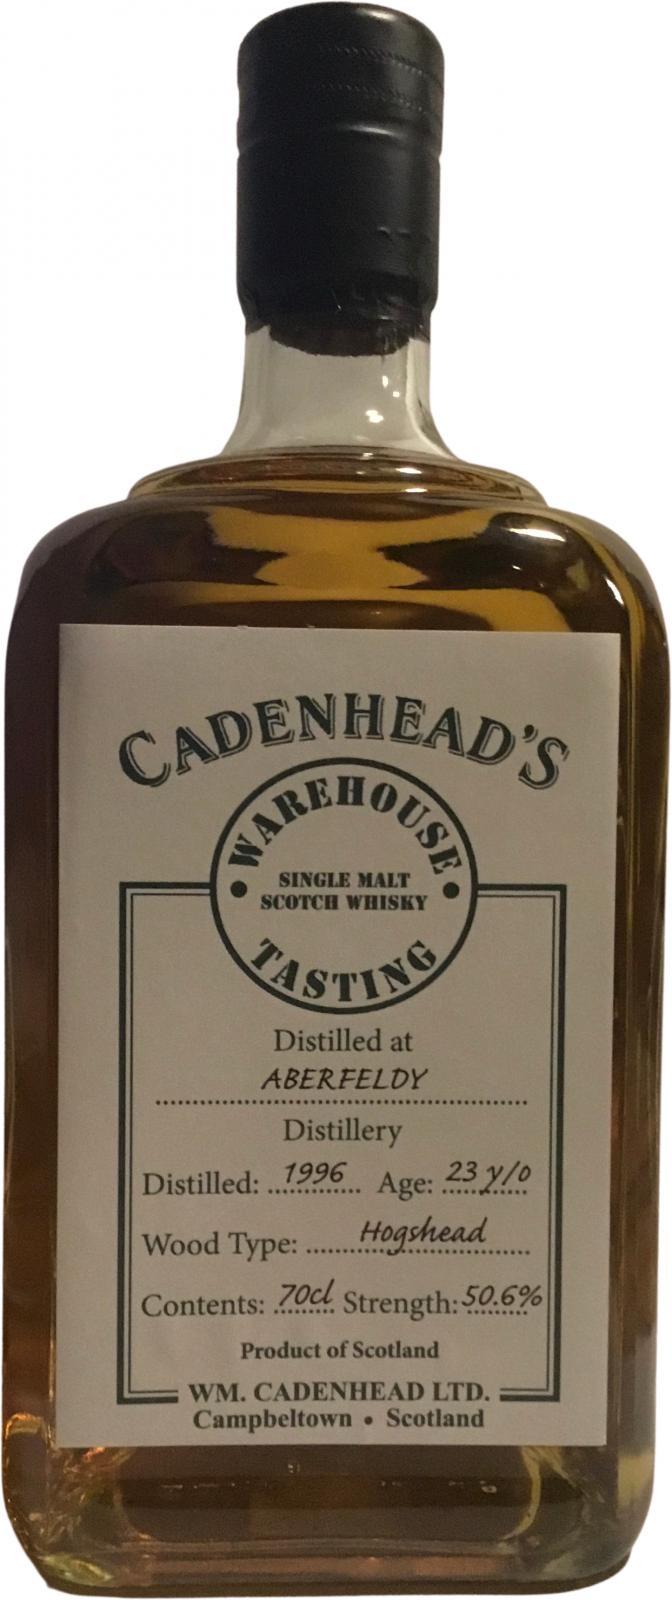 Aberfeldy 1996 CA